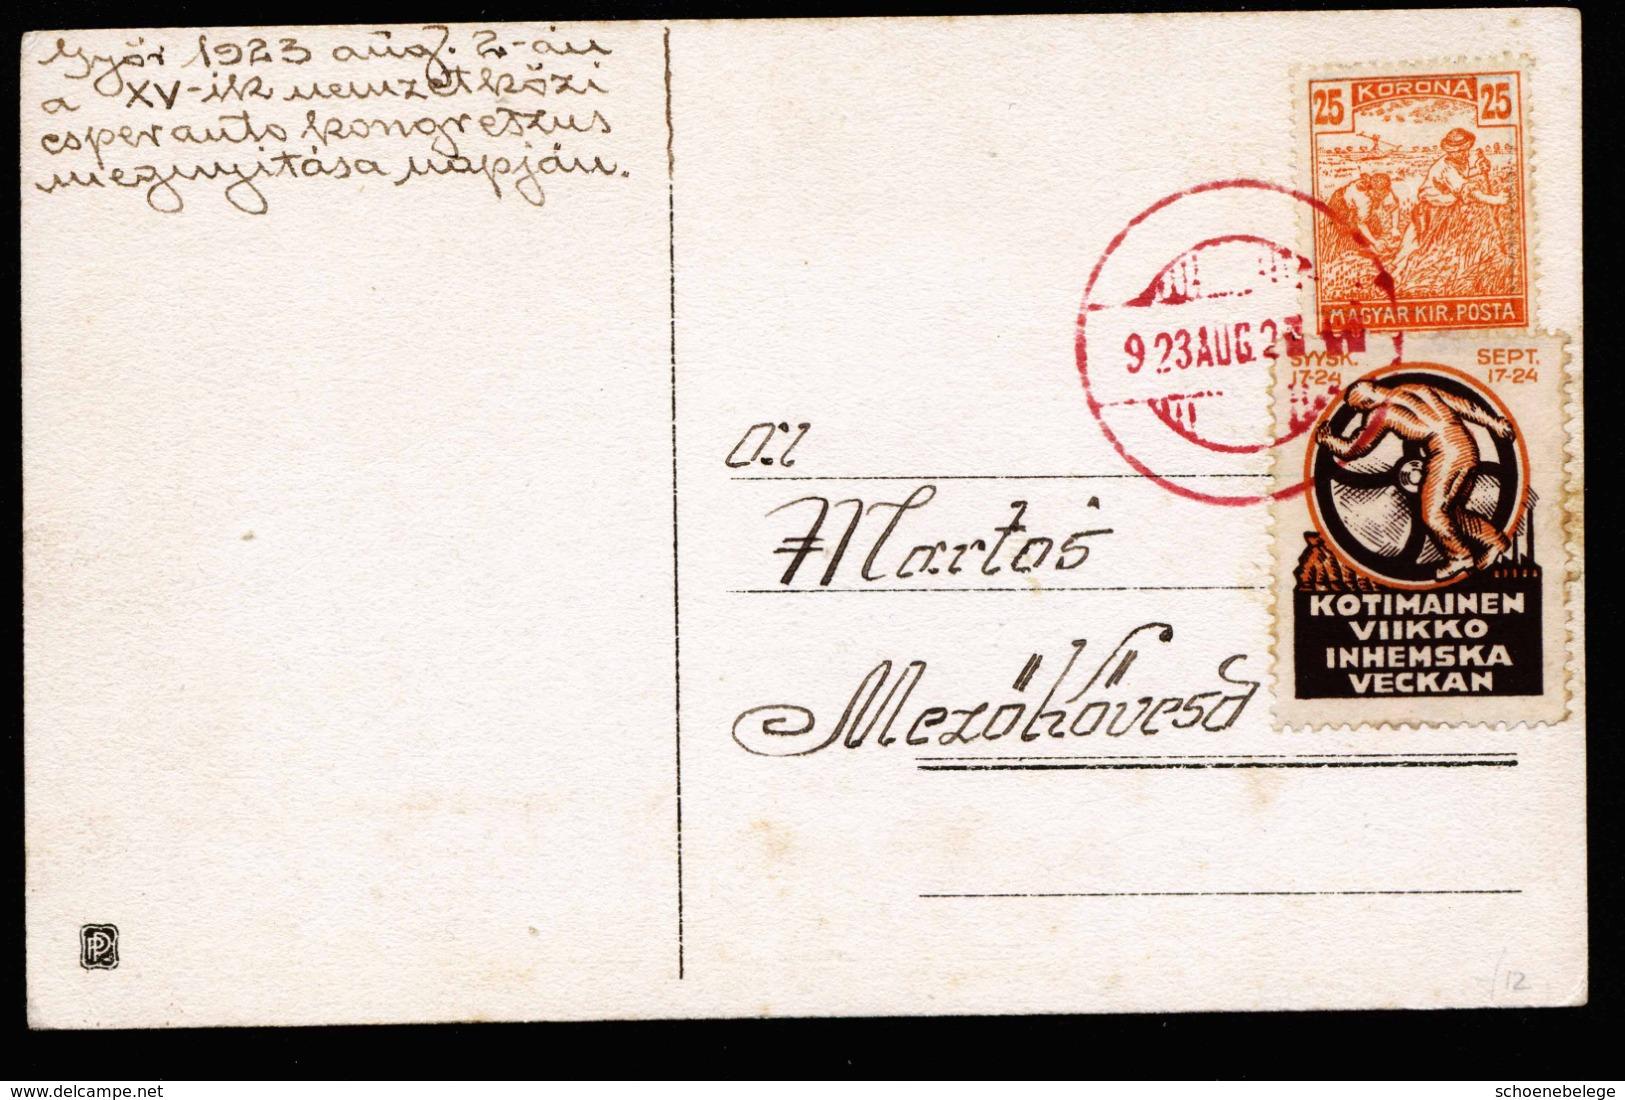 A6327) Ungarn Hungary Handcolorierte Sonderkarte ESPERANTO 1923 Nuernberg Congress - Ungarn